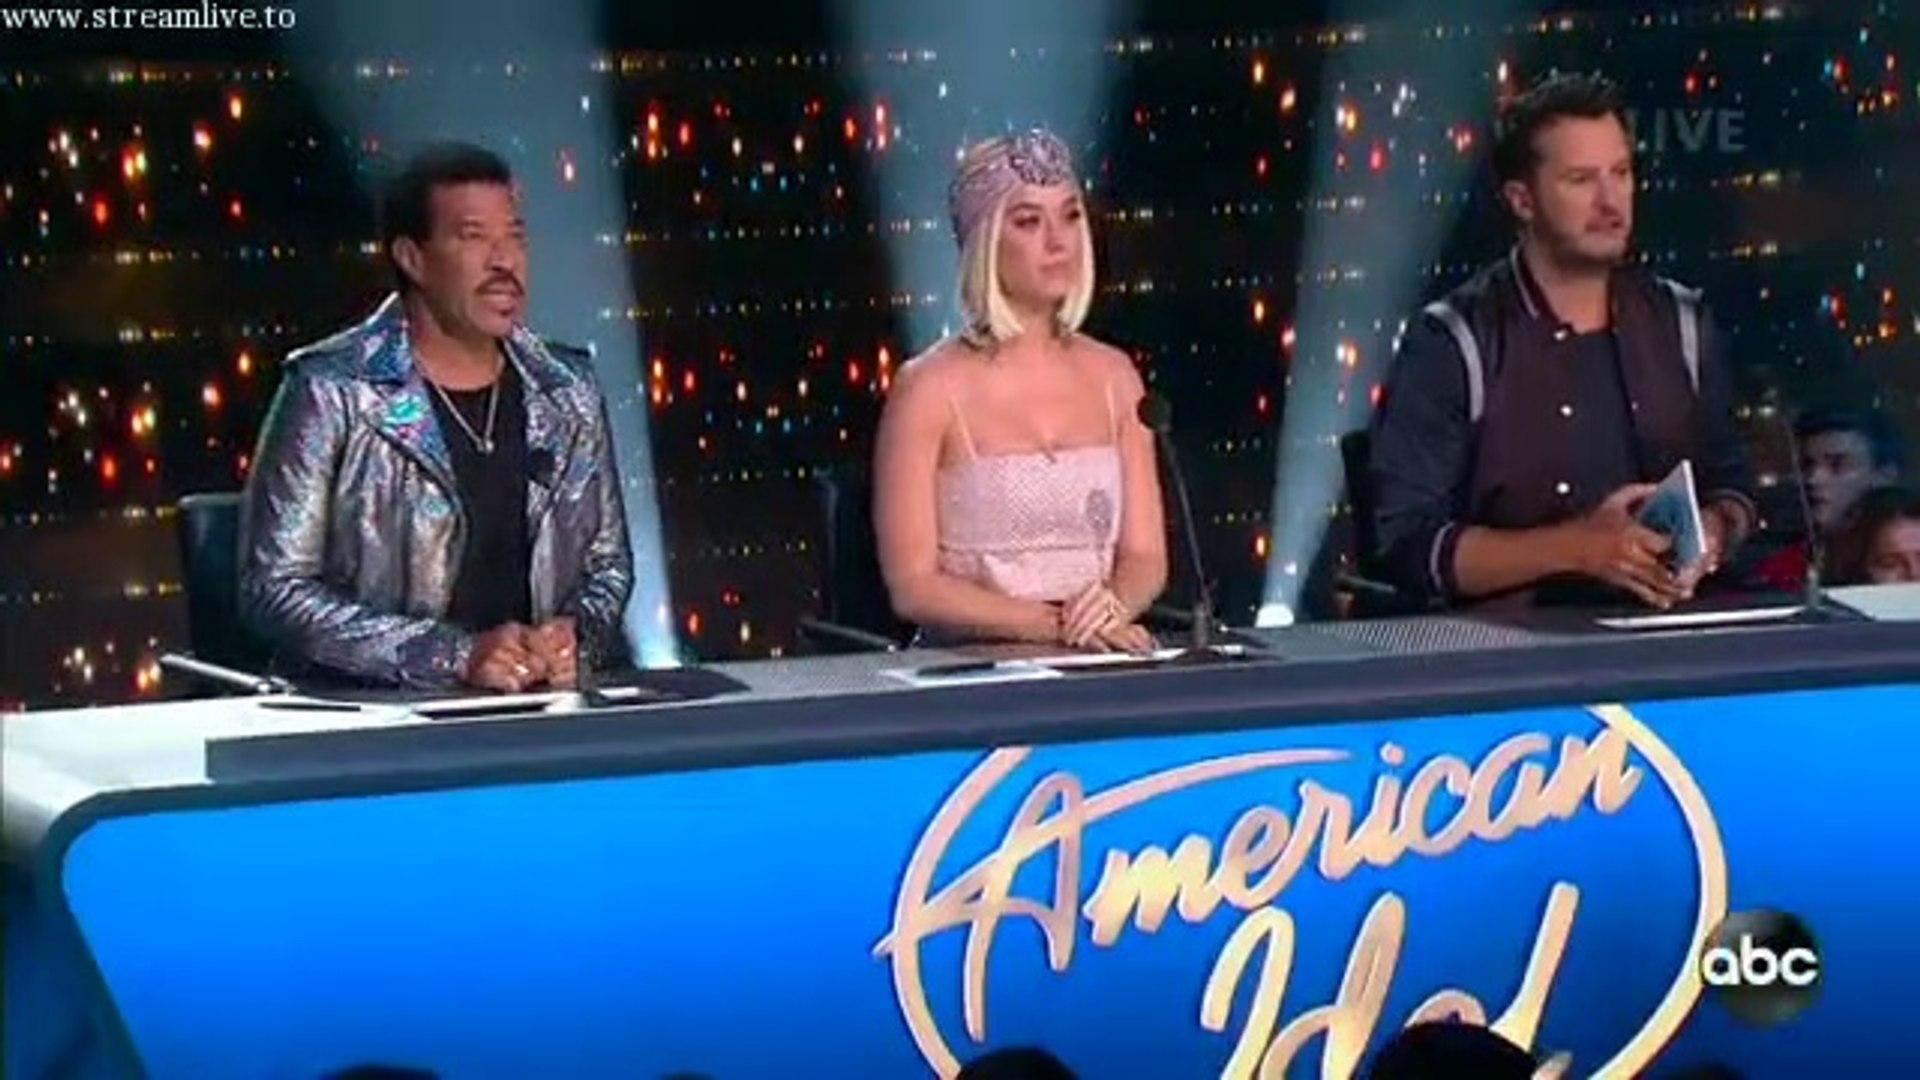 American Idol - S17E16 - Top 8 - April 28, 2019 || American Idol (04/28/2019)